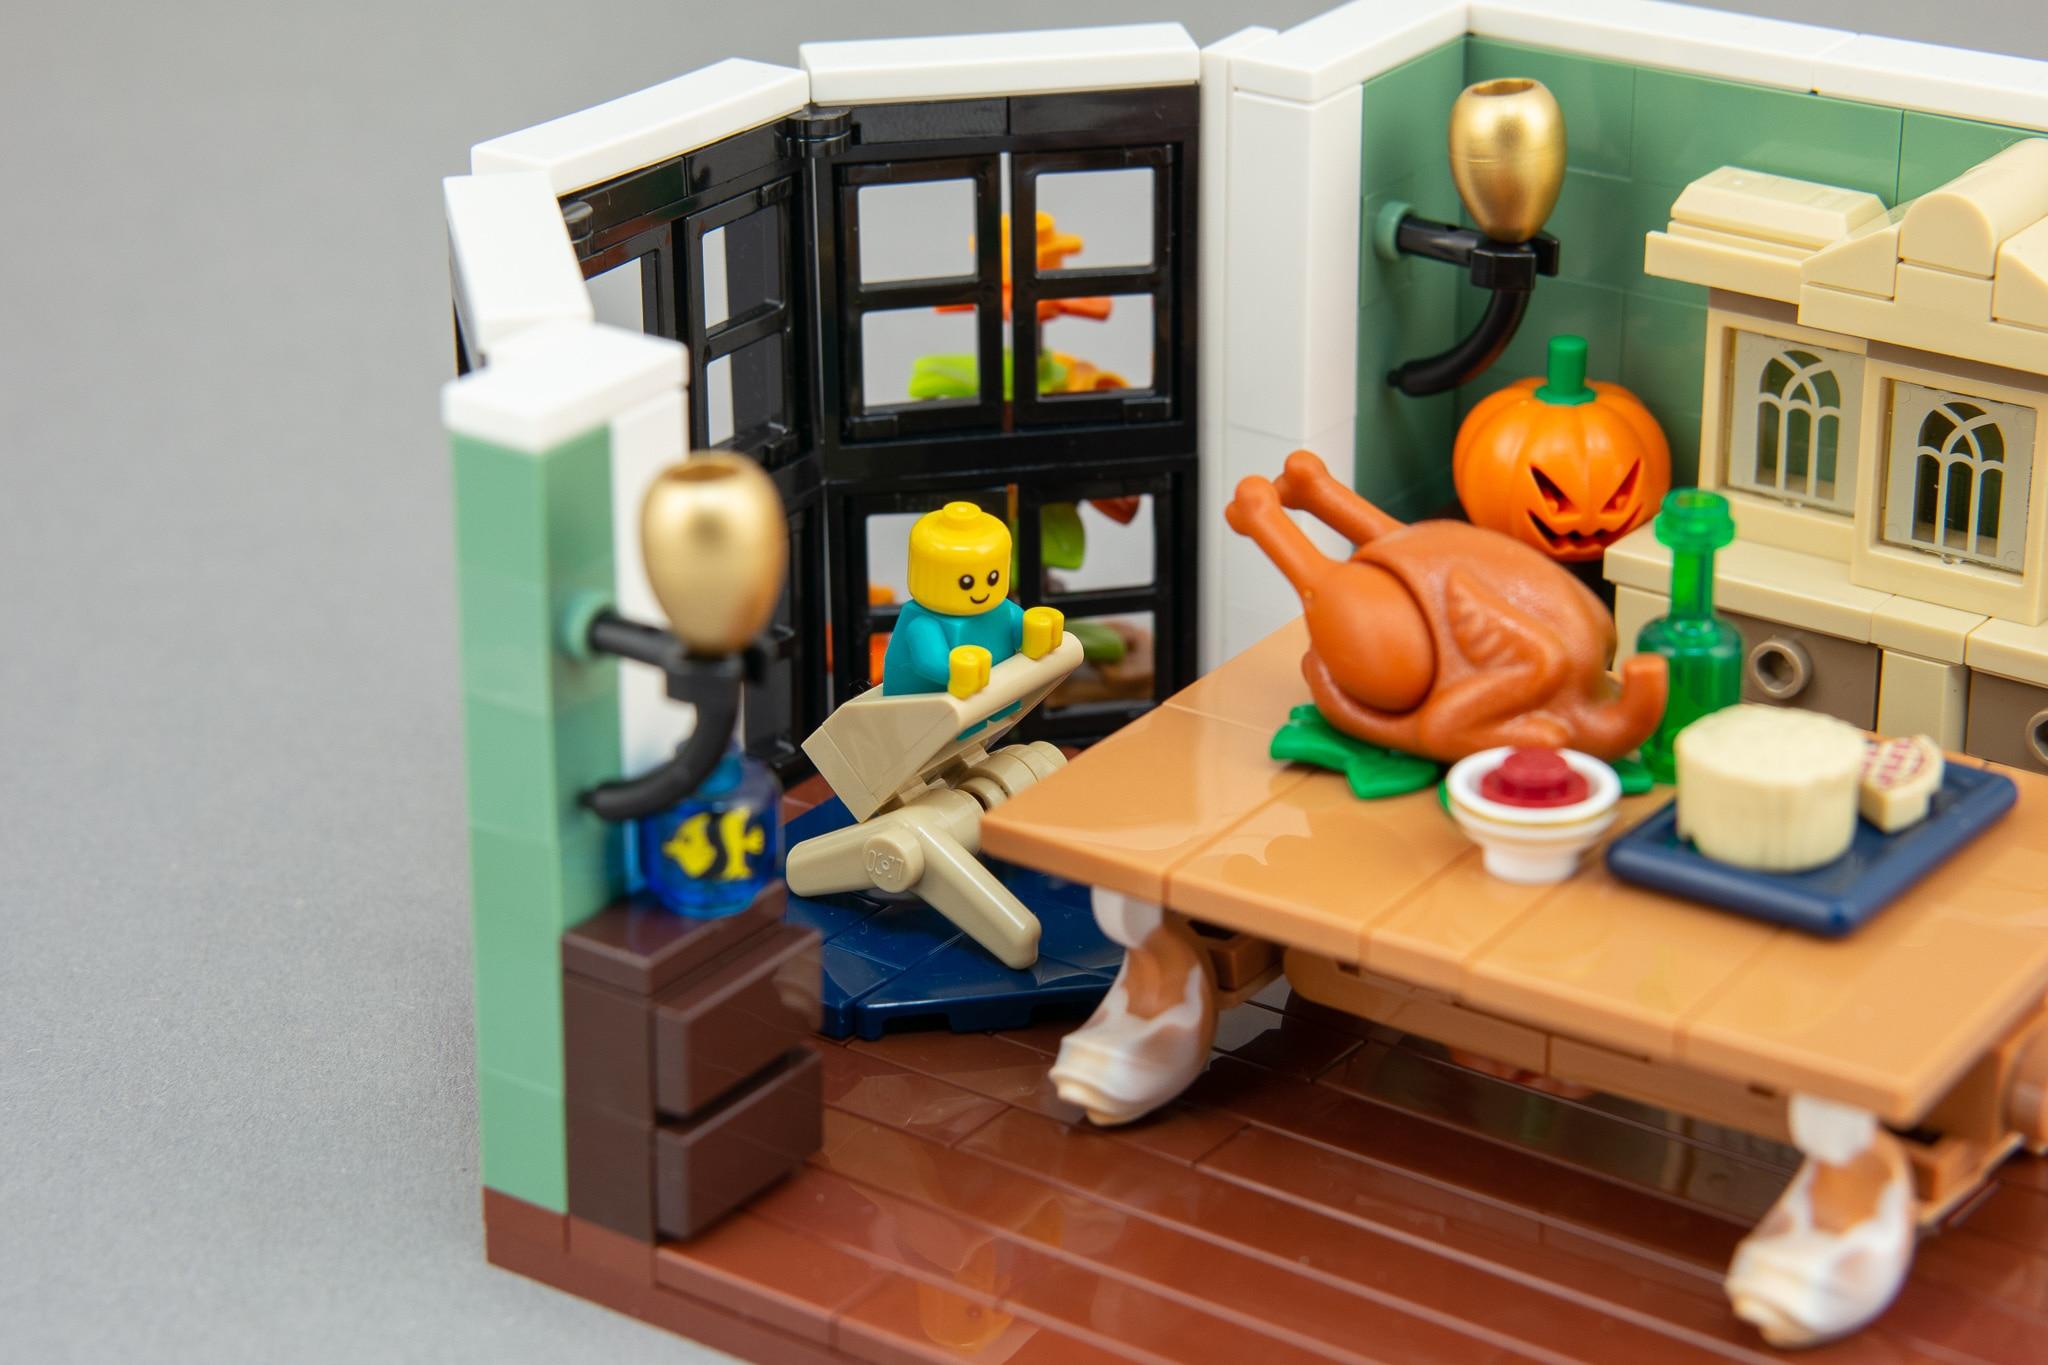 LEGO Moc Bausinpiration Esszimmer (7)